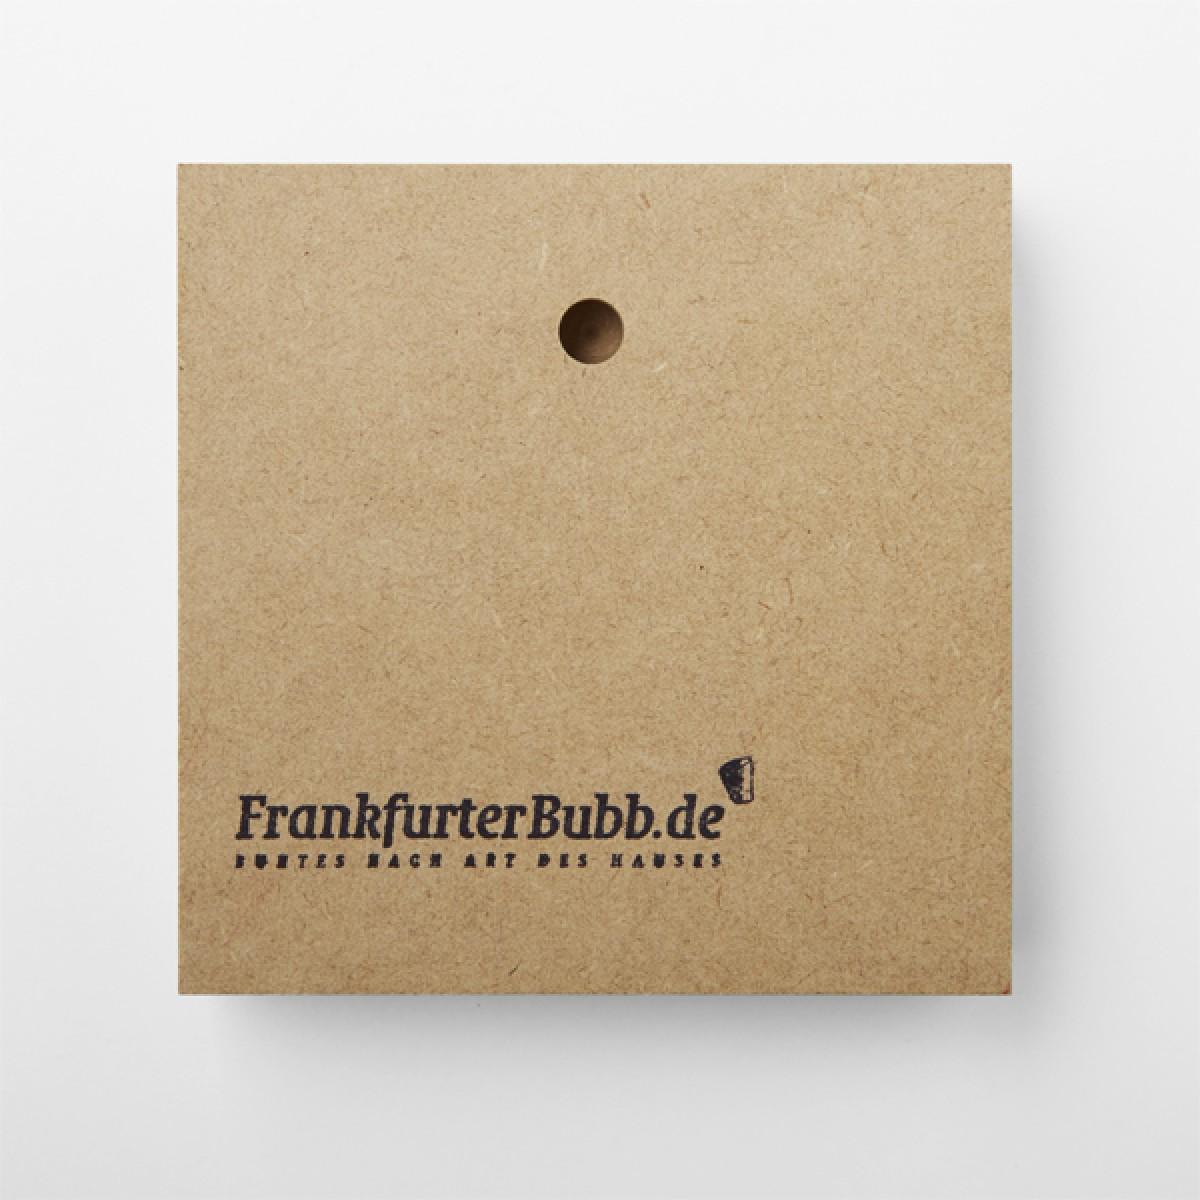 FrankfurterBubb Sehnsucht Foto-Kachel